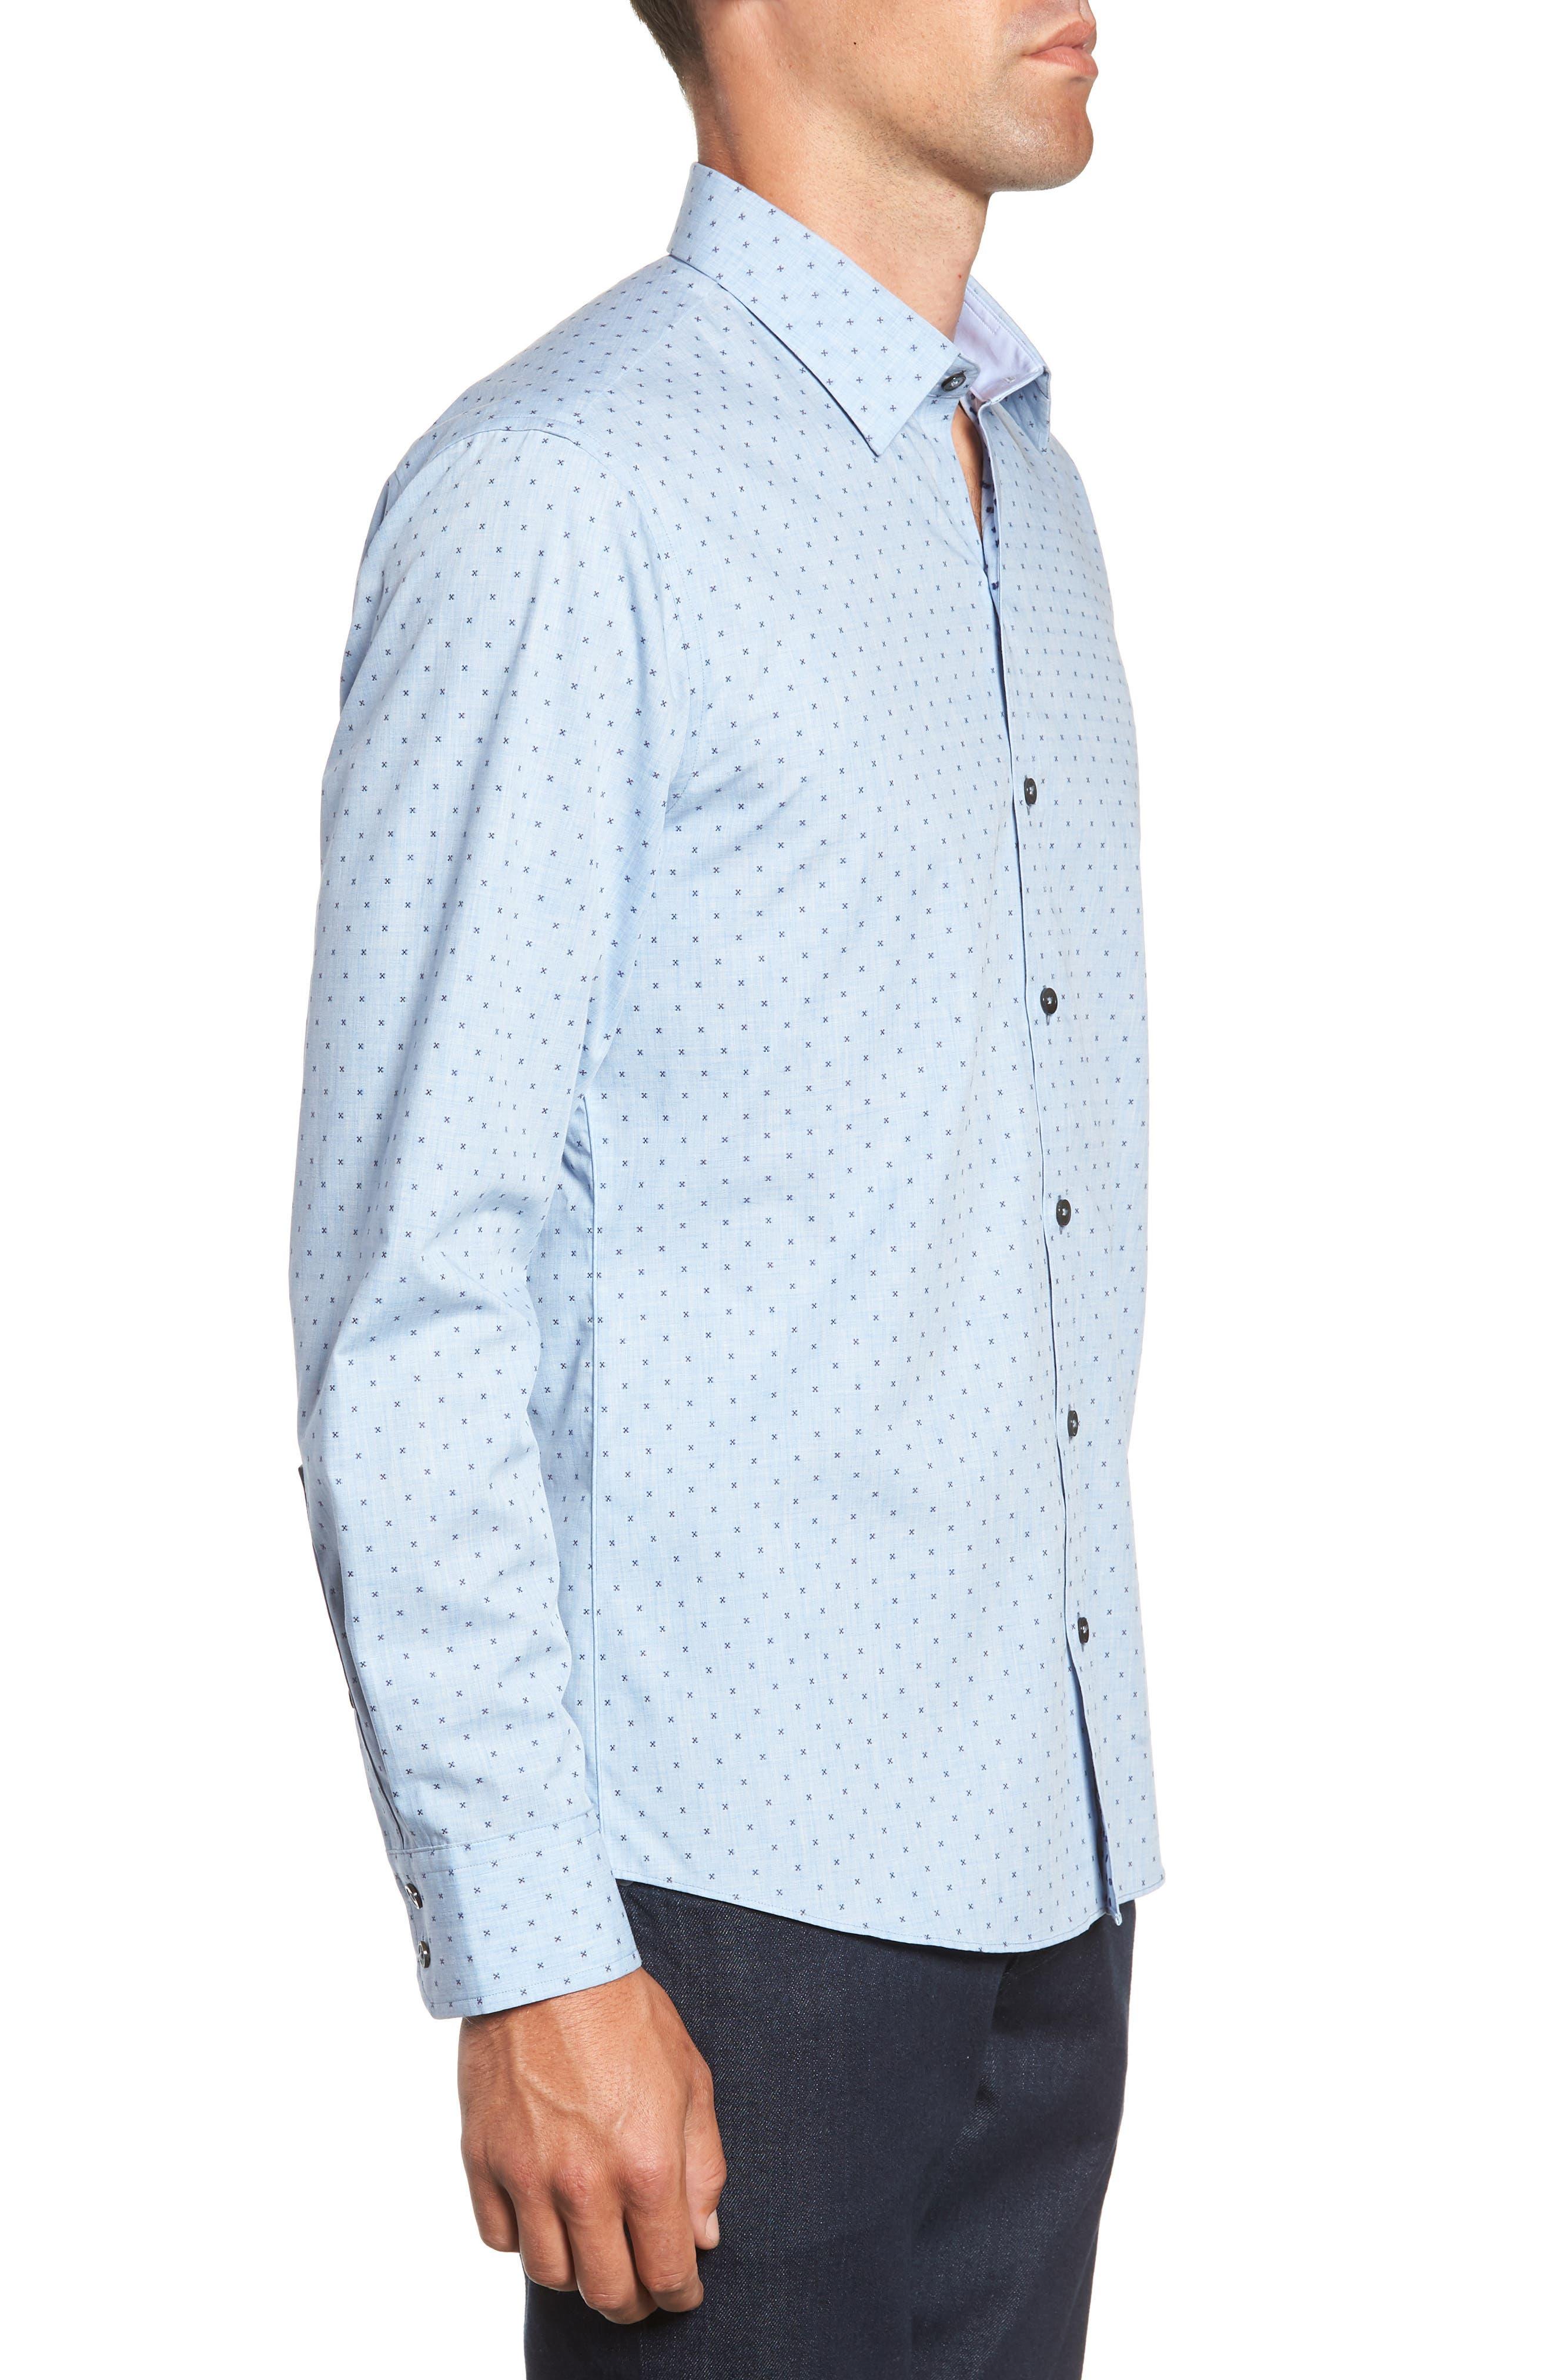 Zhang Regular Fit Sport Shirt,                             Alternate thumbnail 4, color,                             LIGHT BLUE